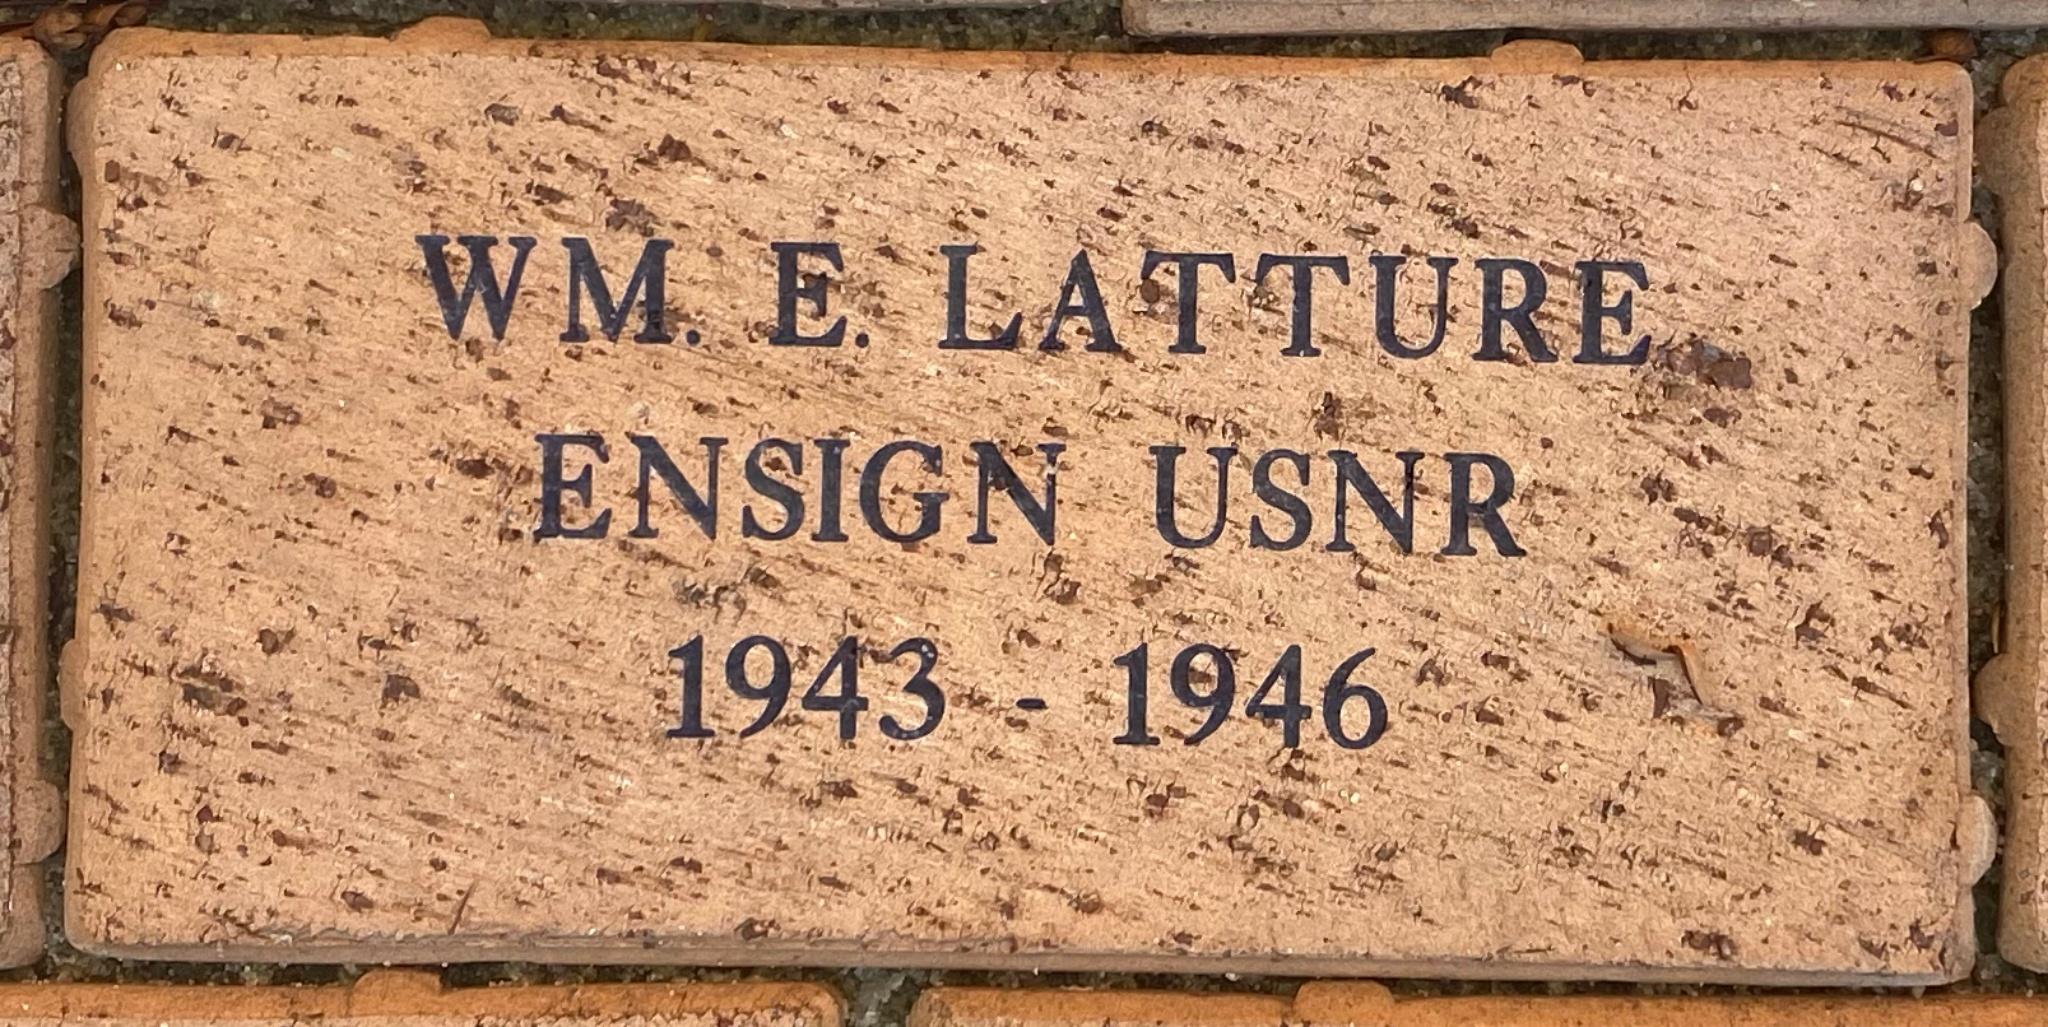 WM E. LATTURE ENSIGN USNR 1943 – 1946